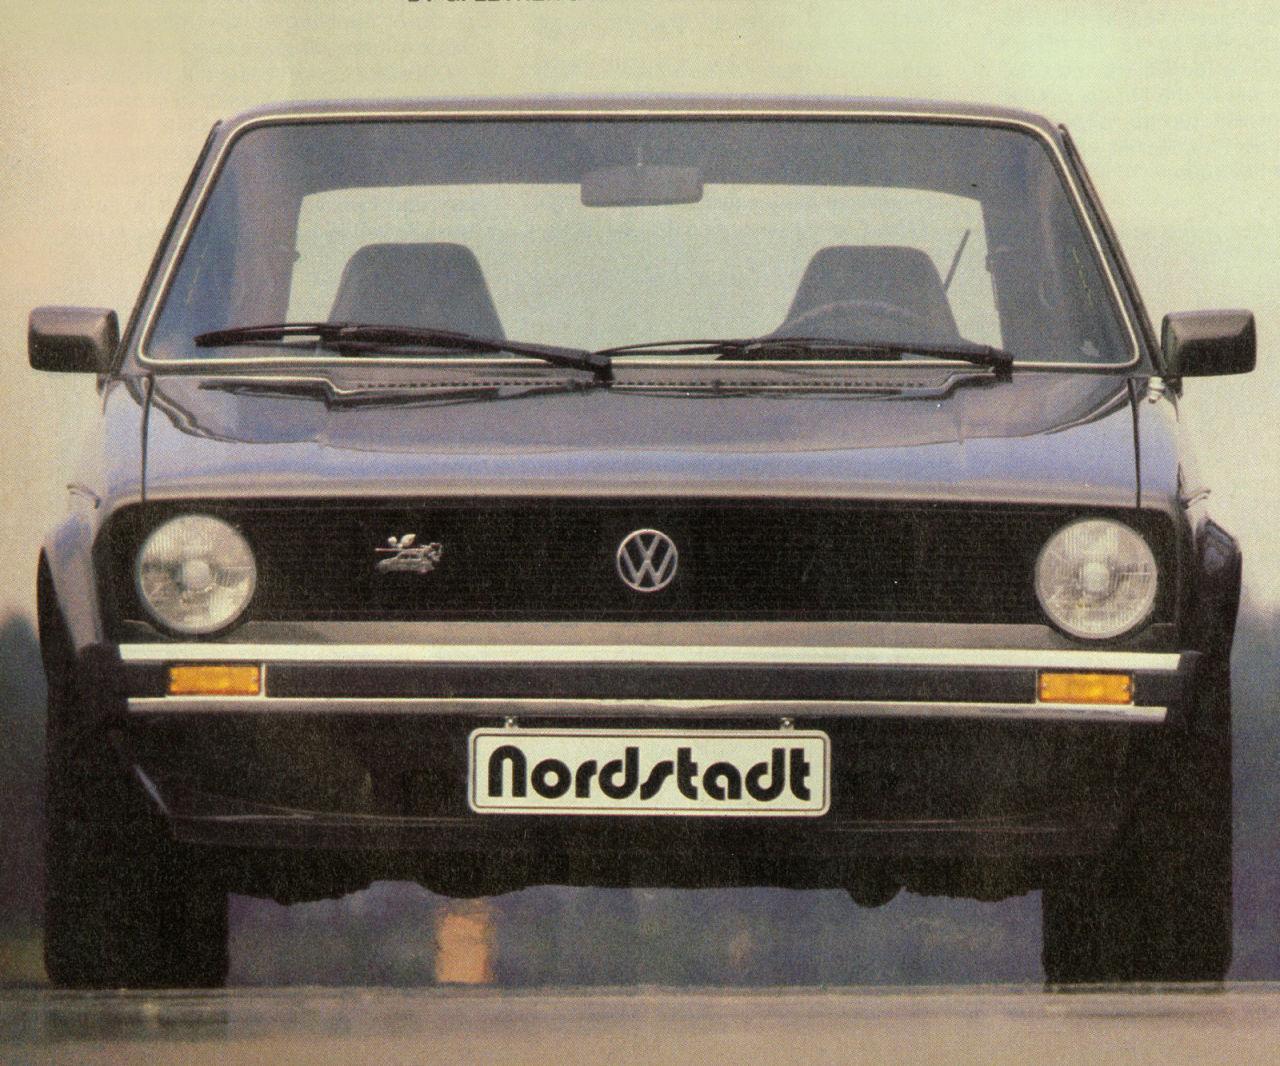 Volkswagen Golf Nordstadt V8